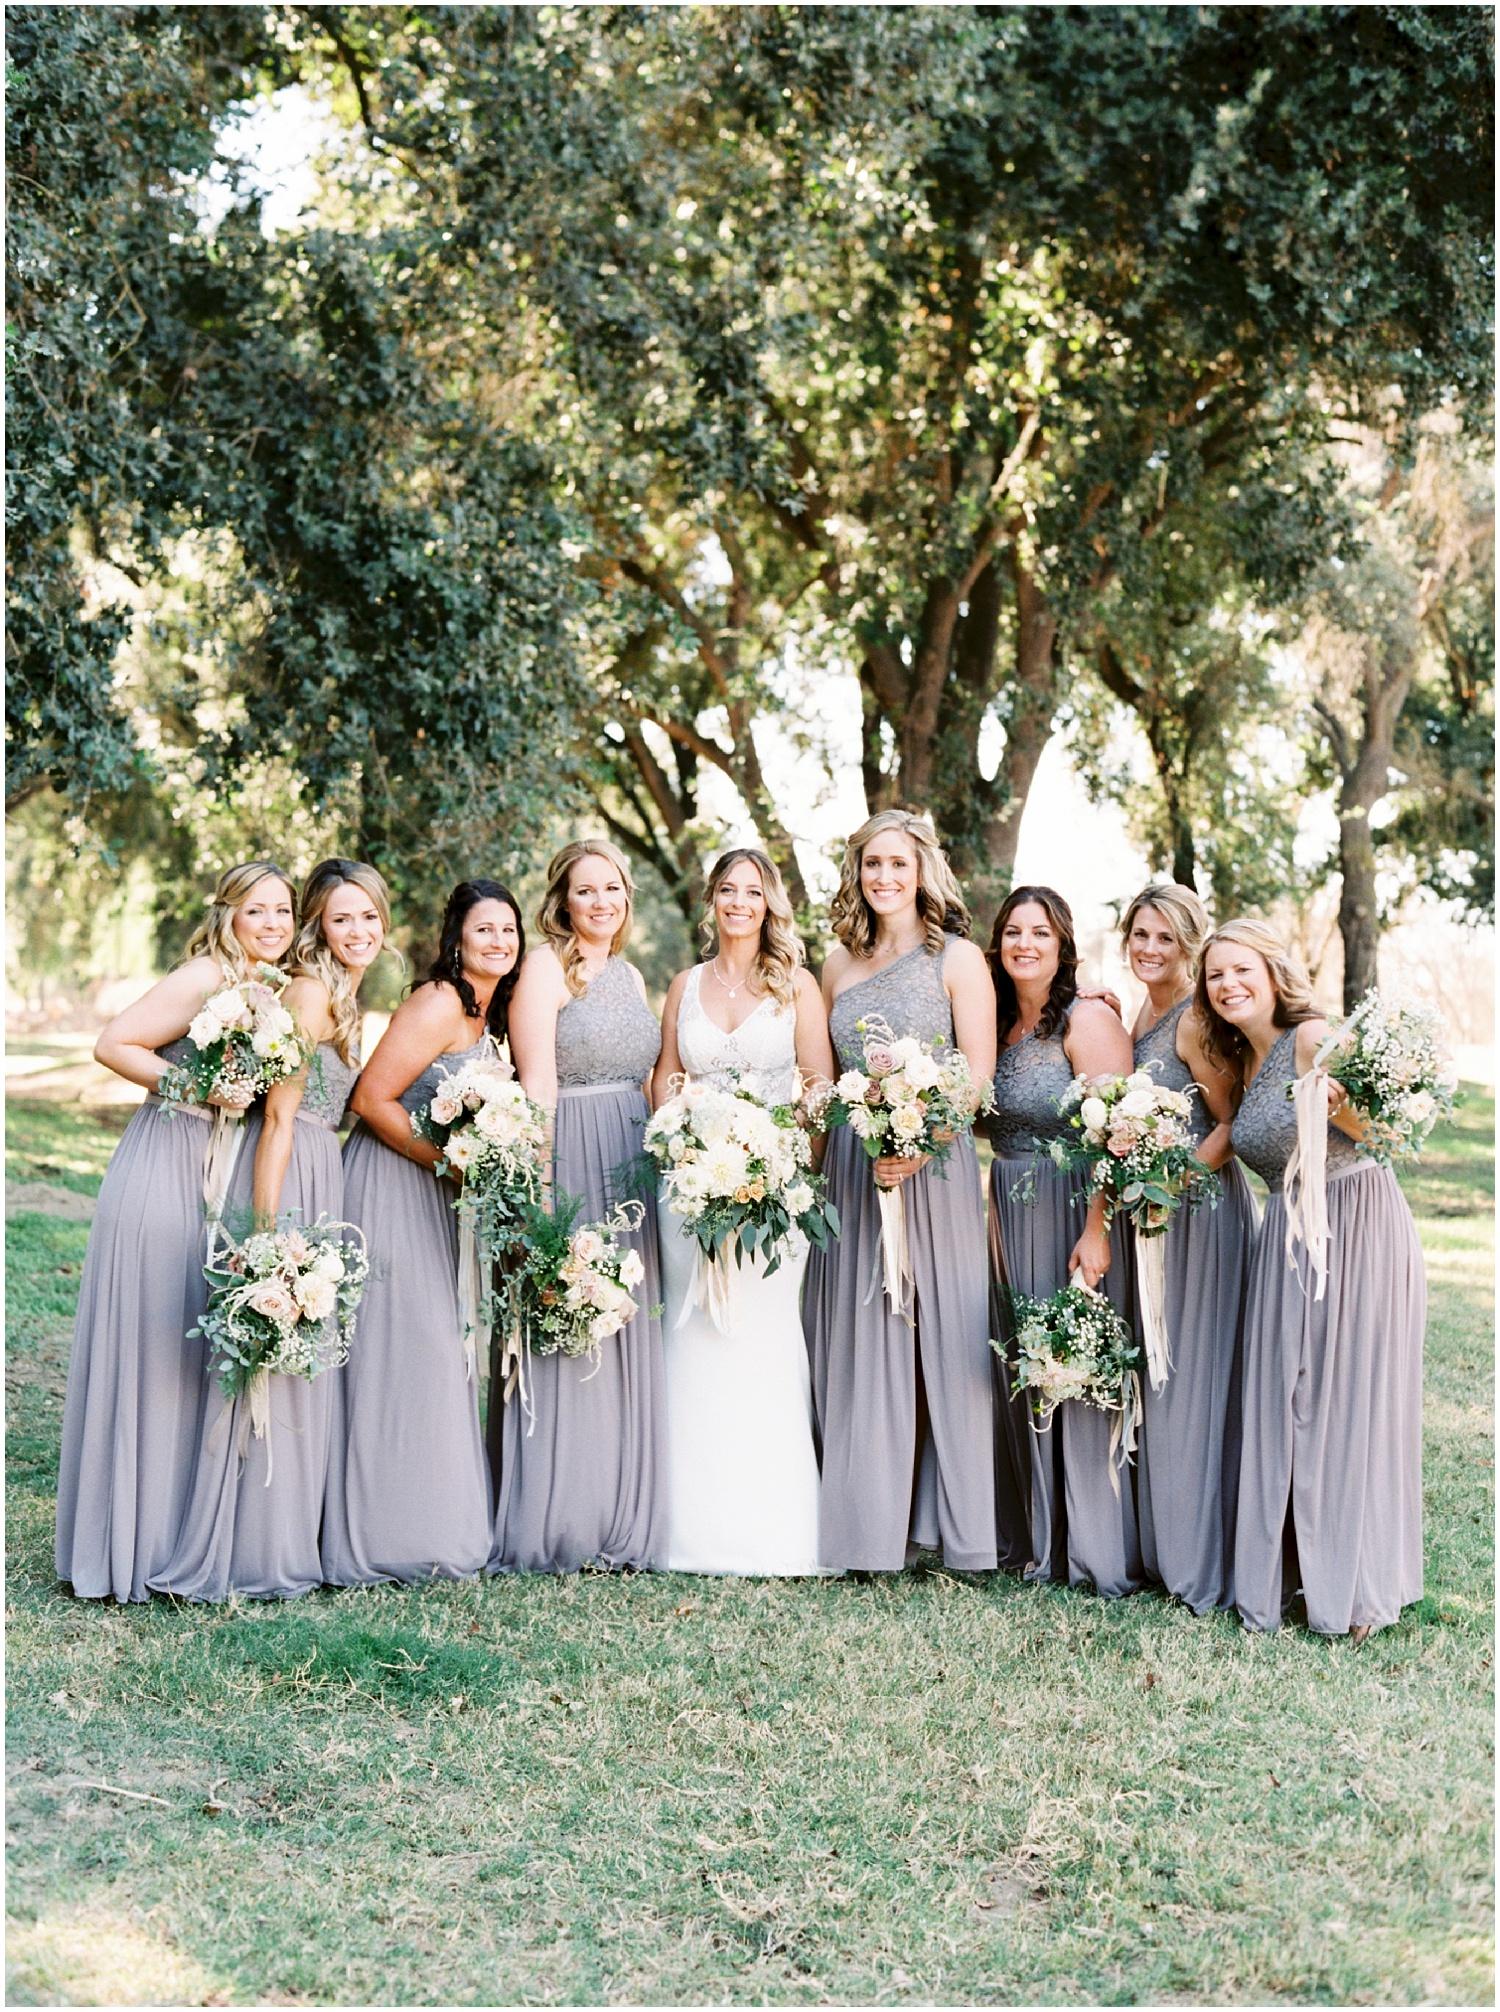 Fresno Wedding photography, Fresno Wedding photographers, California fine art wedding photographer, Fresno Wedding Photography, California Wedding Photographers, Paso Robles wedding photographer